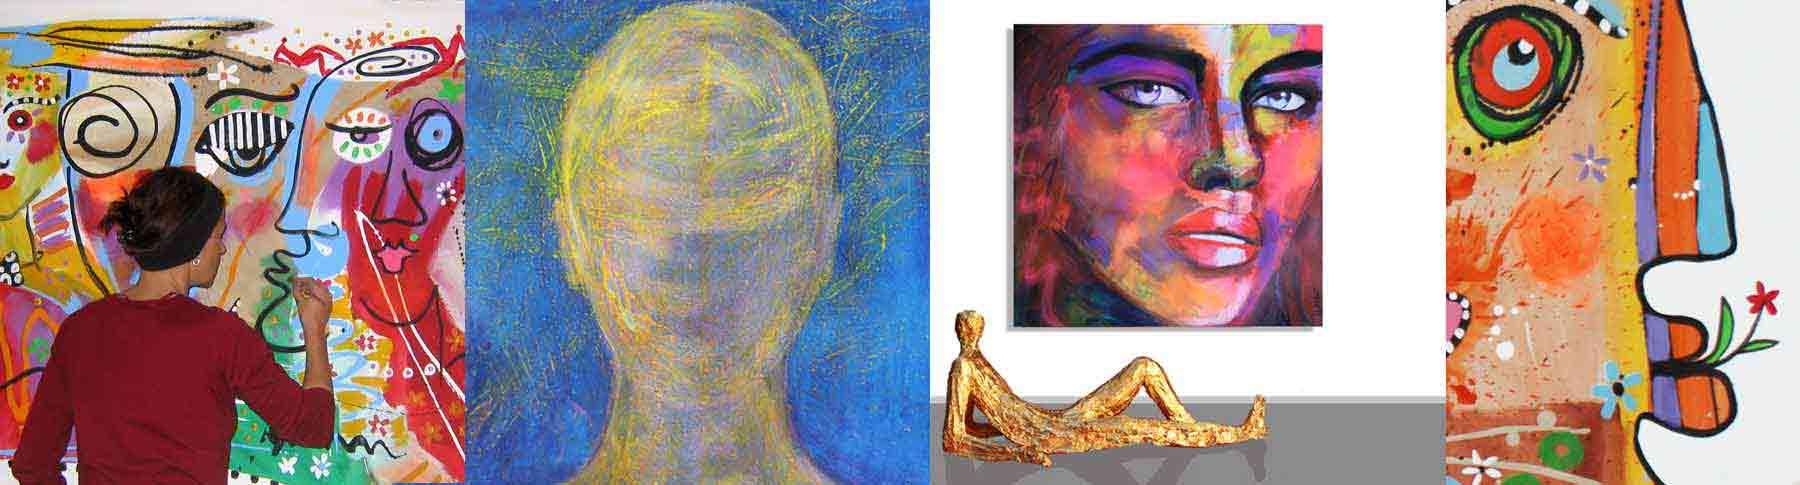 Portaitmalerei: Gesichter Gemälde